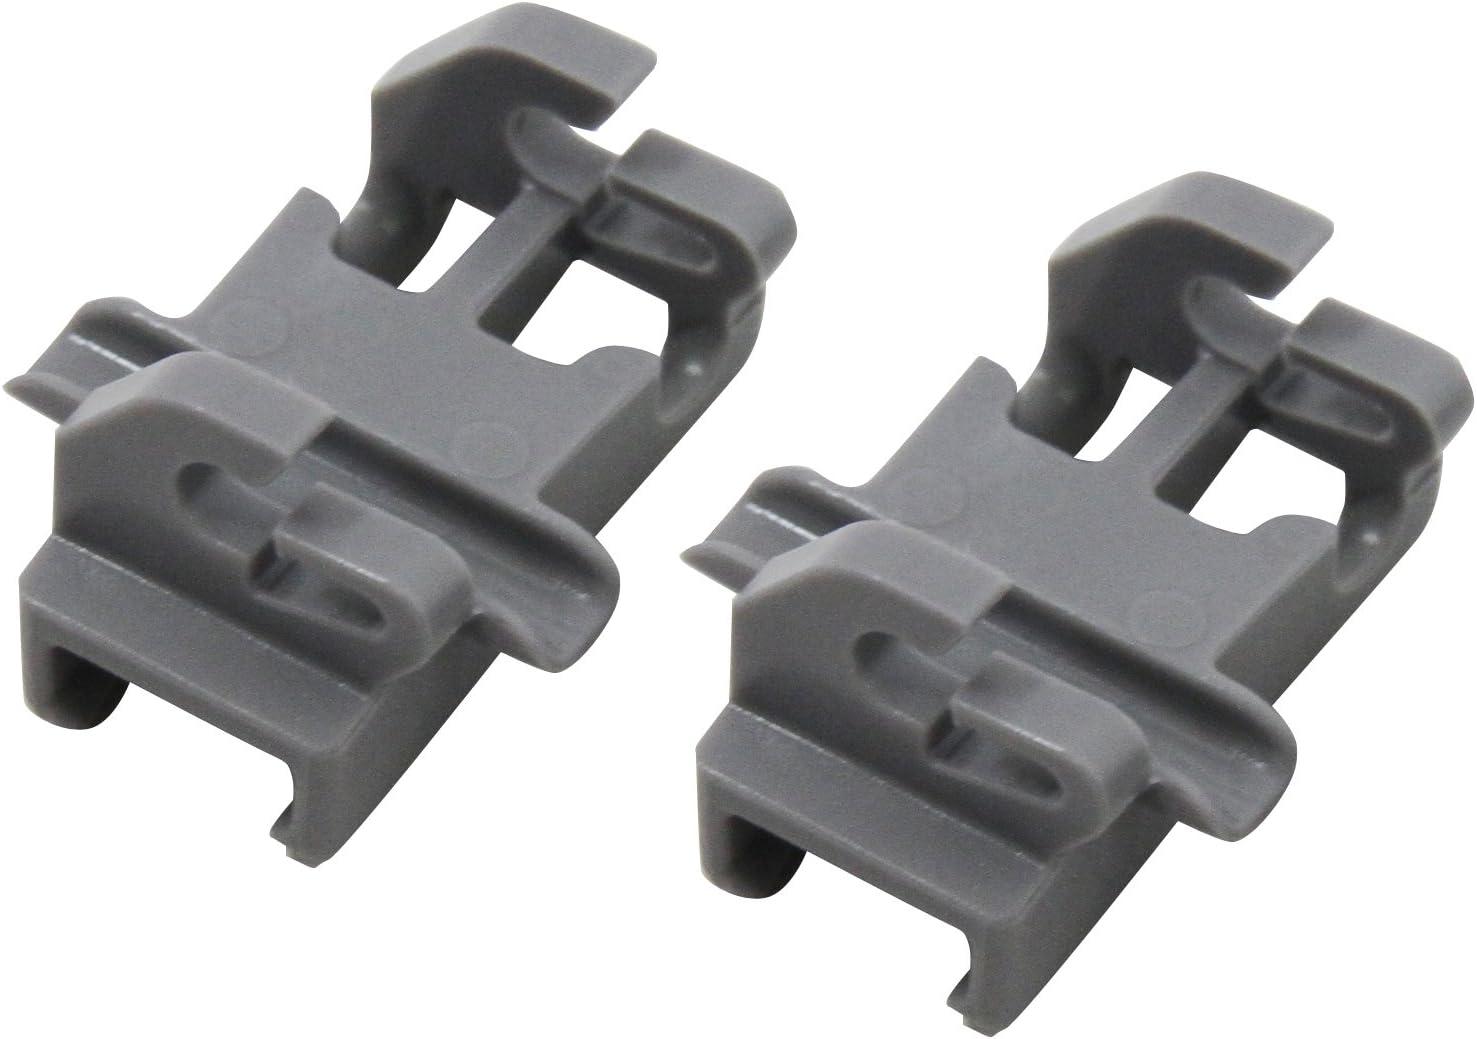 Bosch 00611474 Accessories/Dishwasher Bearing – Latch/Clamp